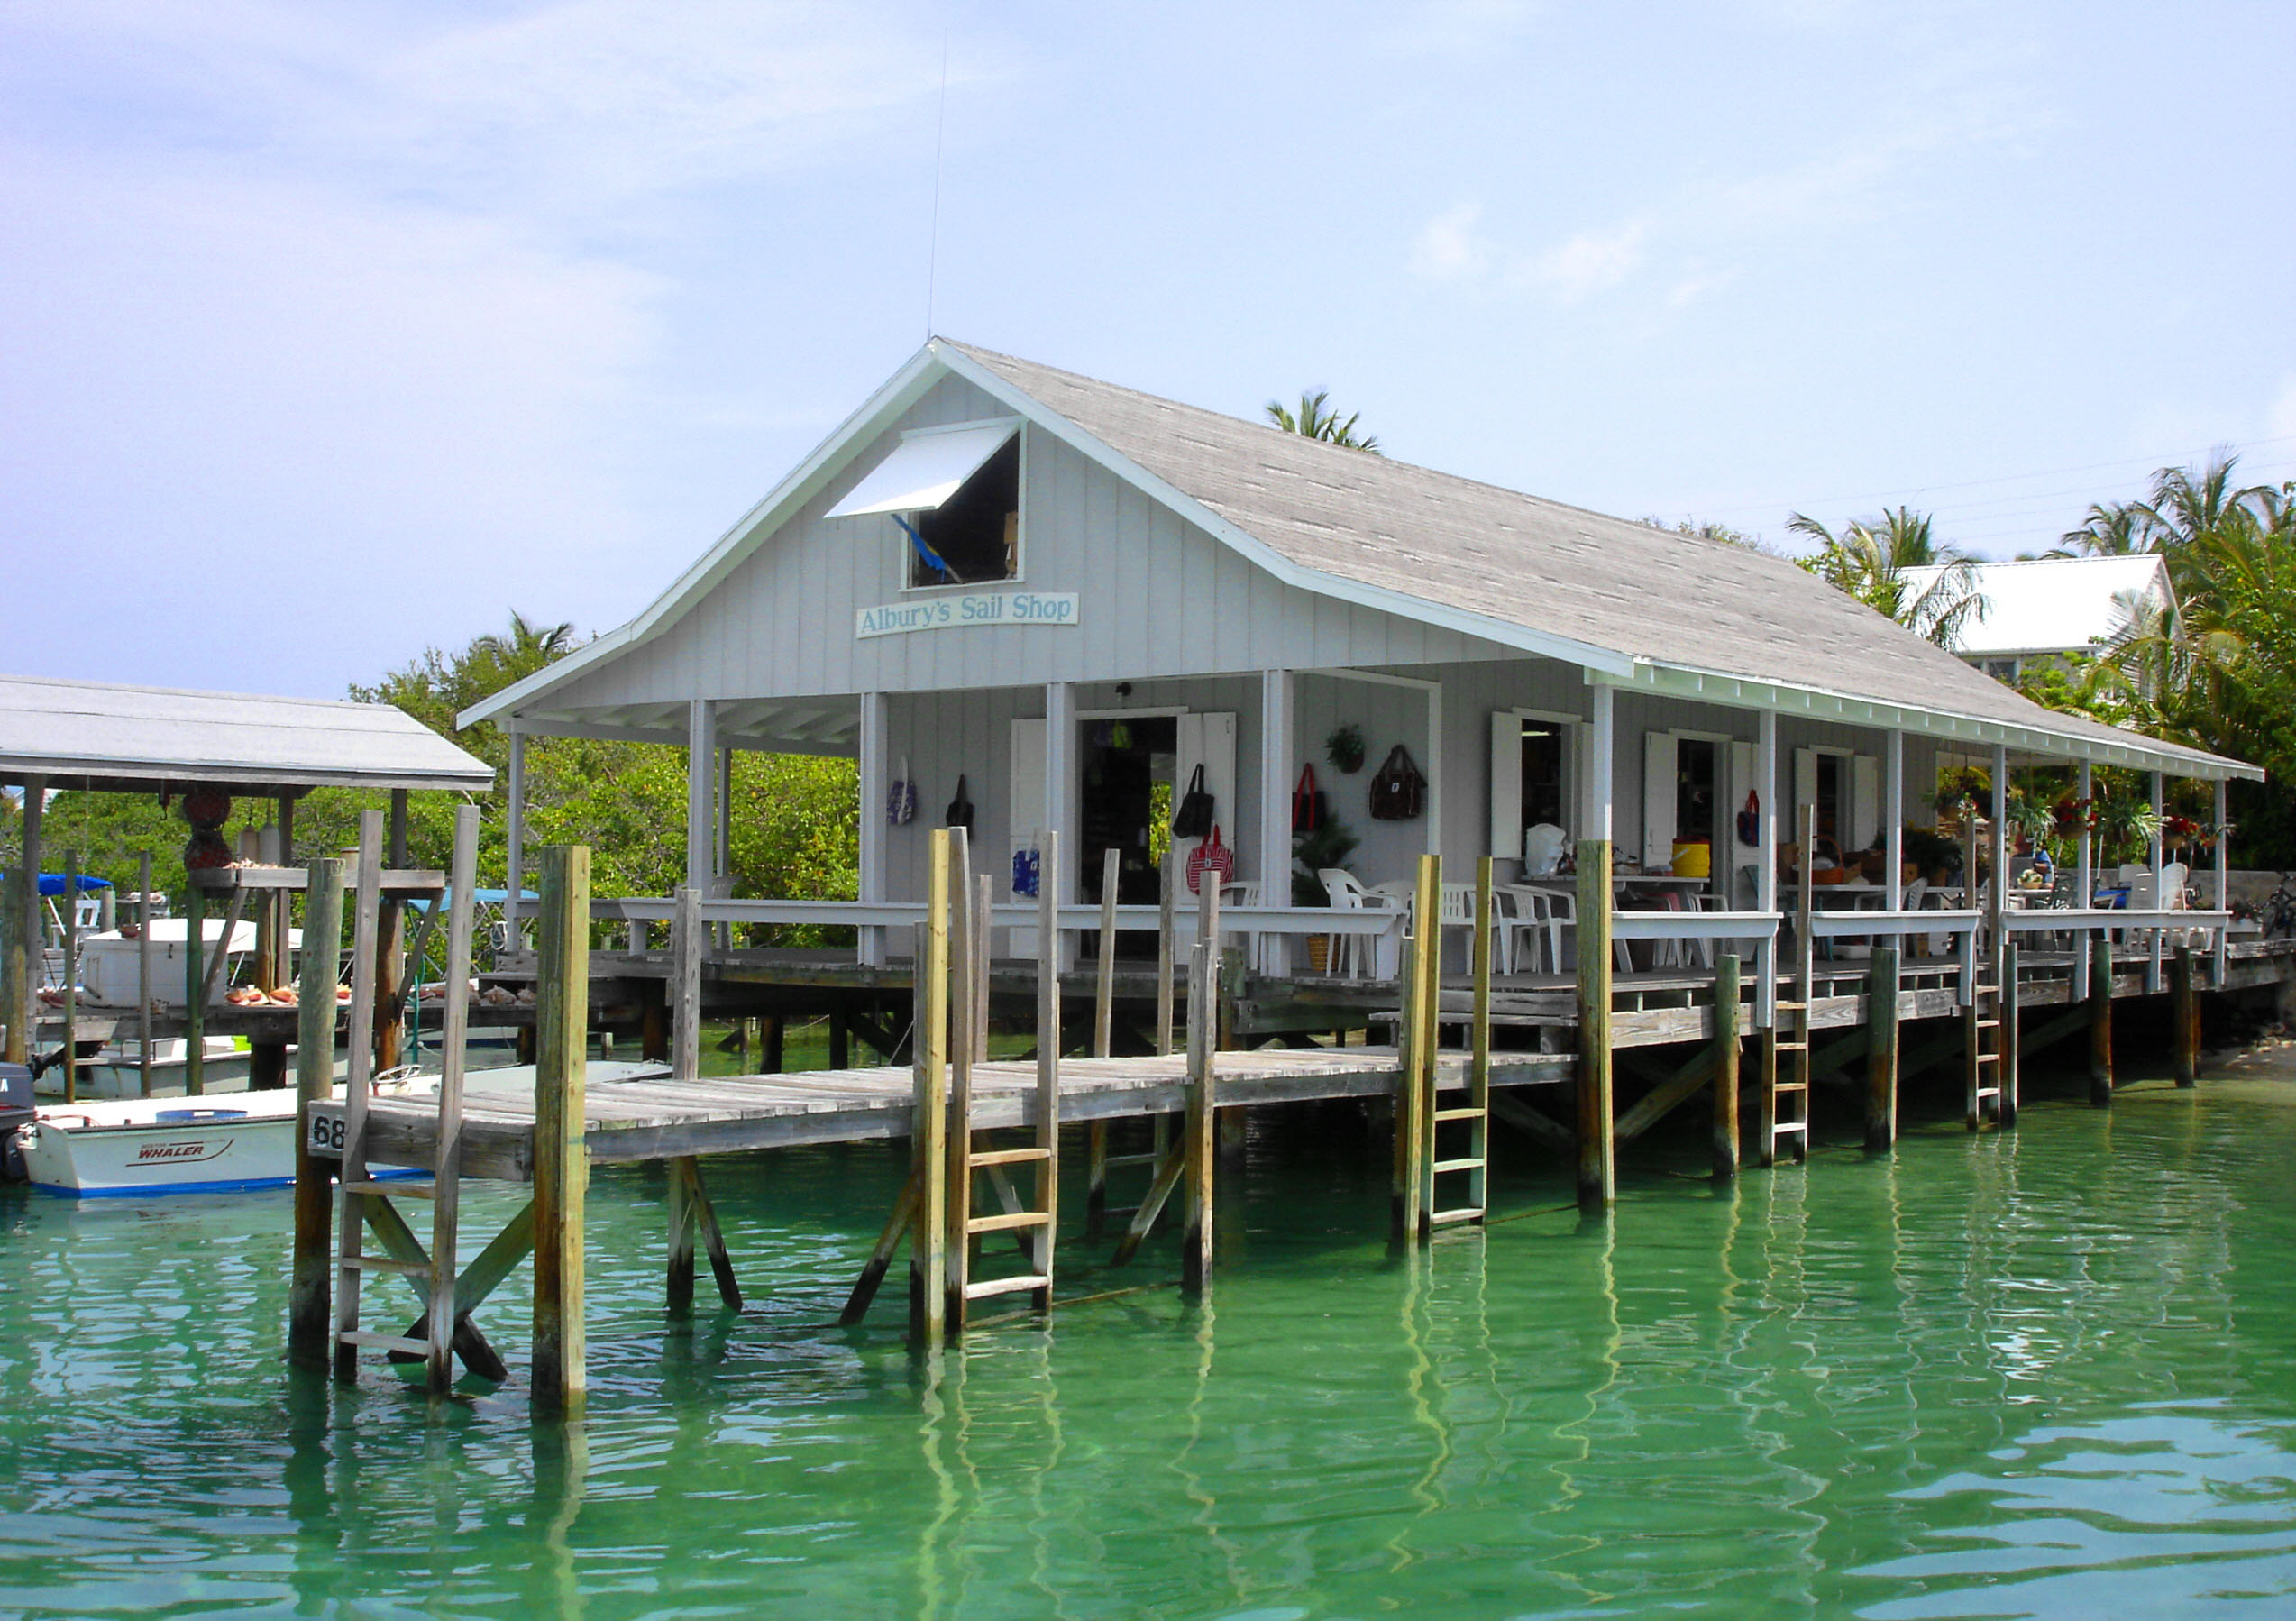 abaco, bahamas, man-o-war, albury's sail shop